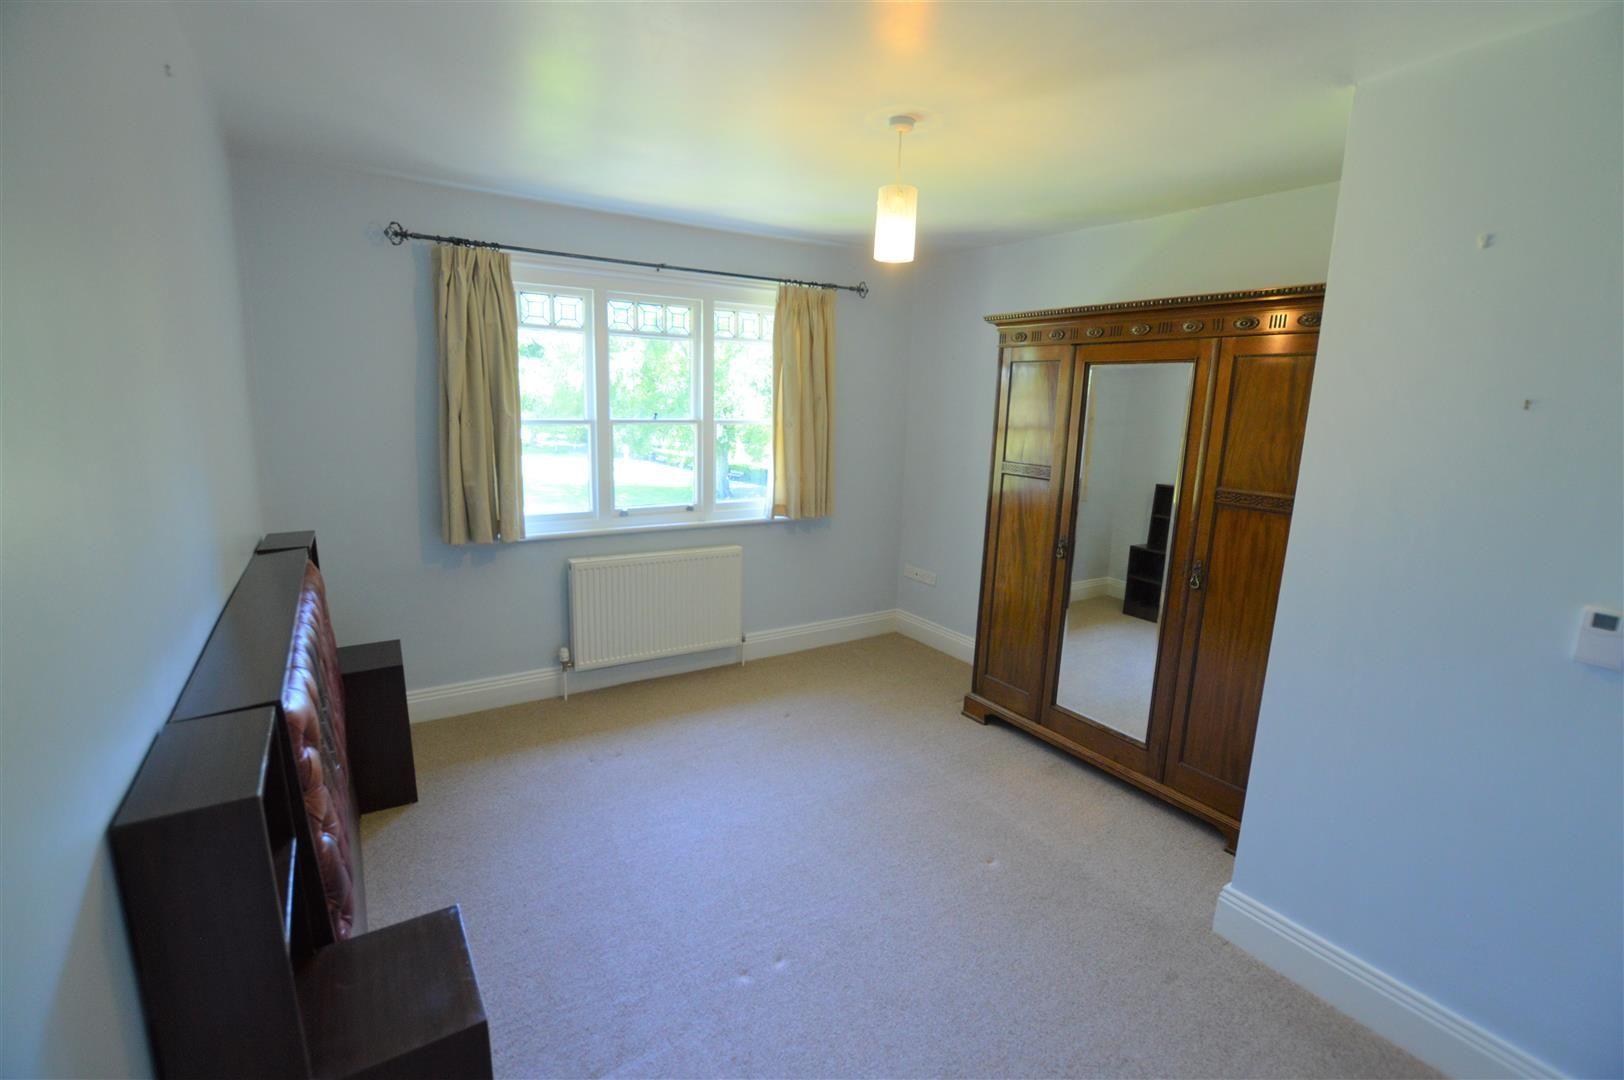 4 bed semi-detached for sale in Etnam Street, Leominster  - Property Image 7